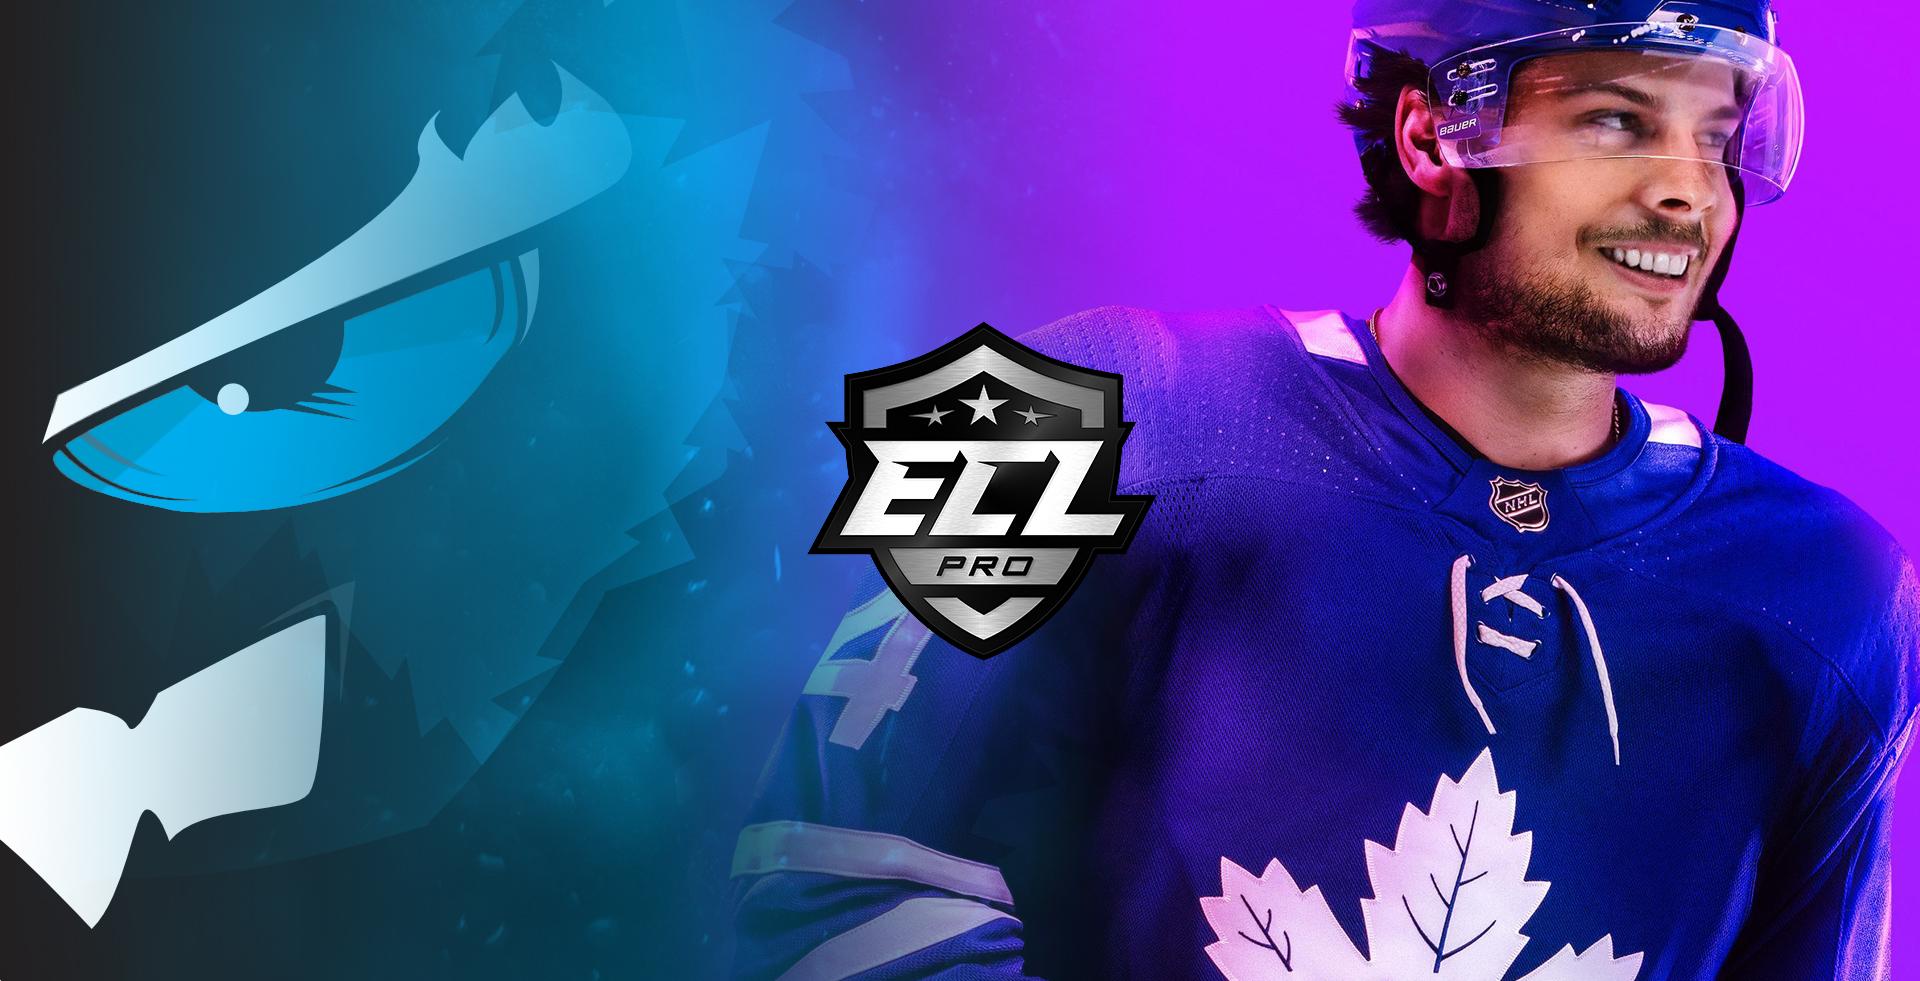 NHLGAMER ECL PRO 12 KAUSI ALKAA